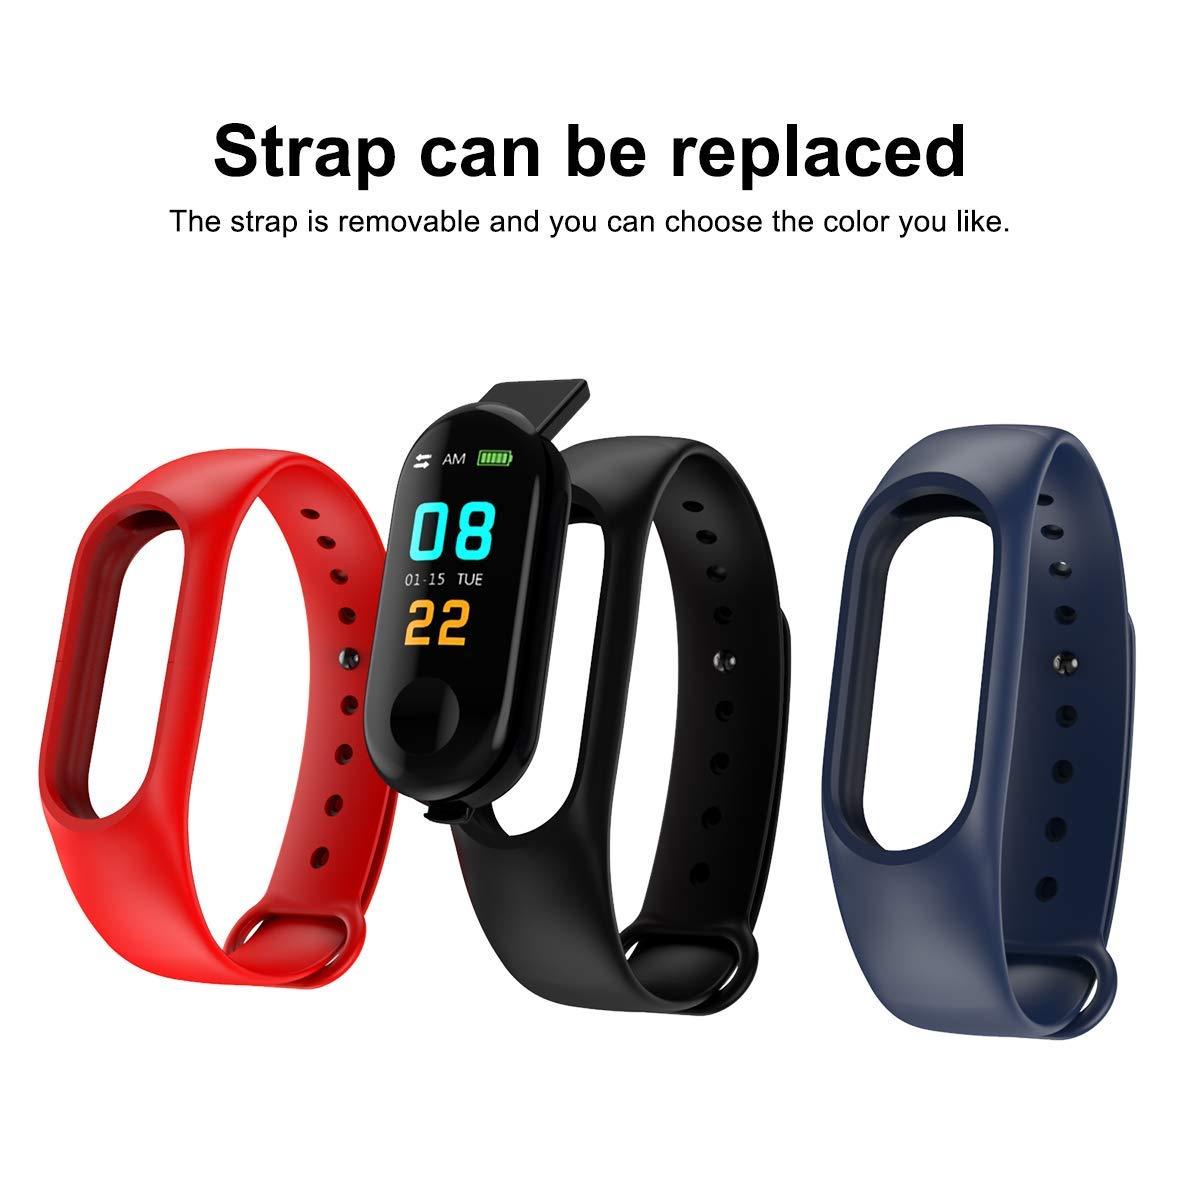 PLEXTONE Fitness Tracker Heart Rate Fitness Wristband Smart Watch Waterproof IPX6 Activity Tracker Blood Pressure Smart Bracelet with Stopwatch Sport GPS Pedometer Women Men (red)